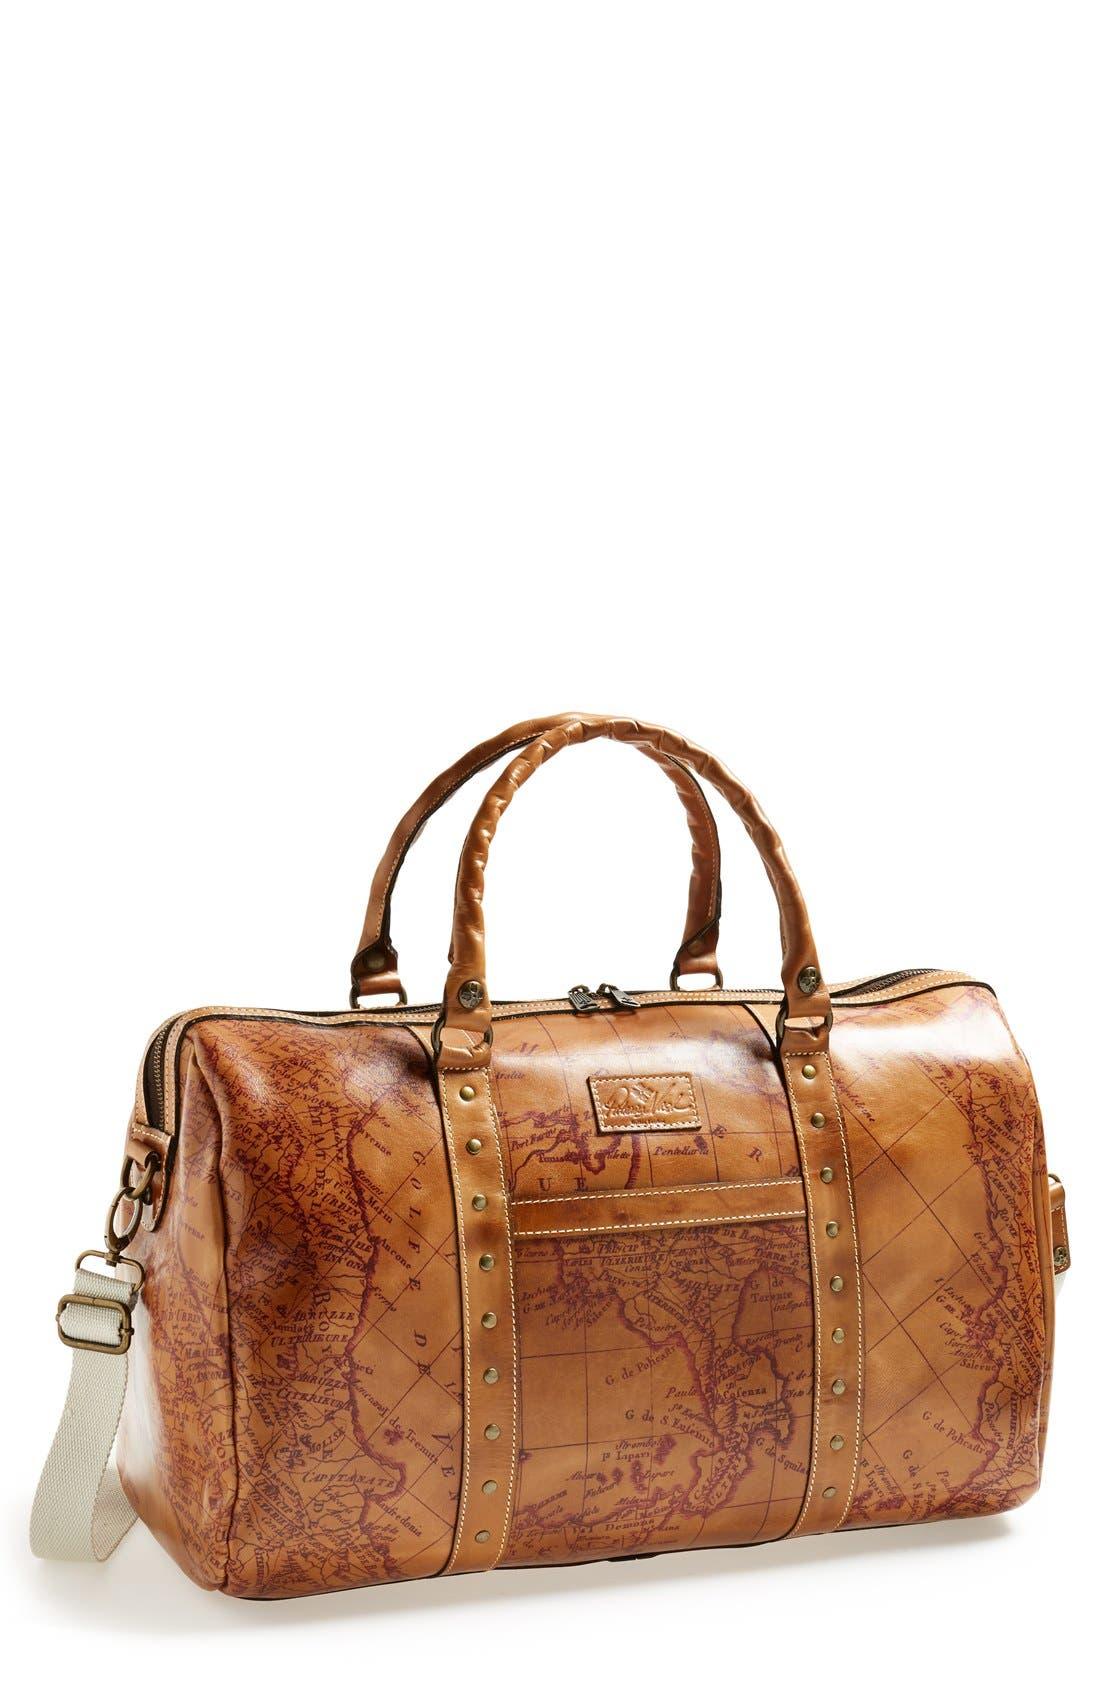 Alternate Image 1 Selected - Patricia Nash 'Milano' Weekend Bag